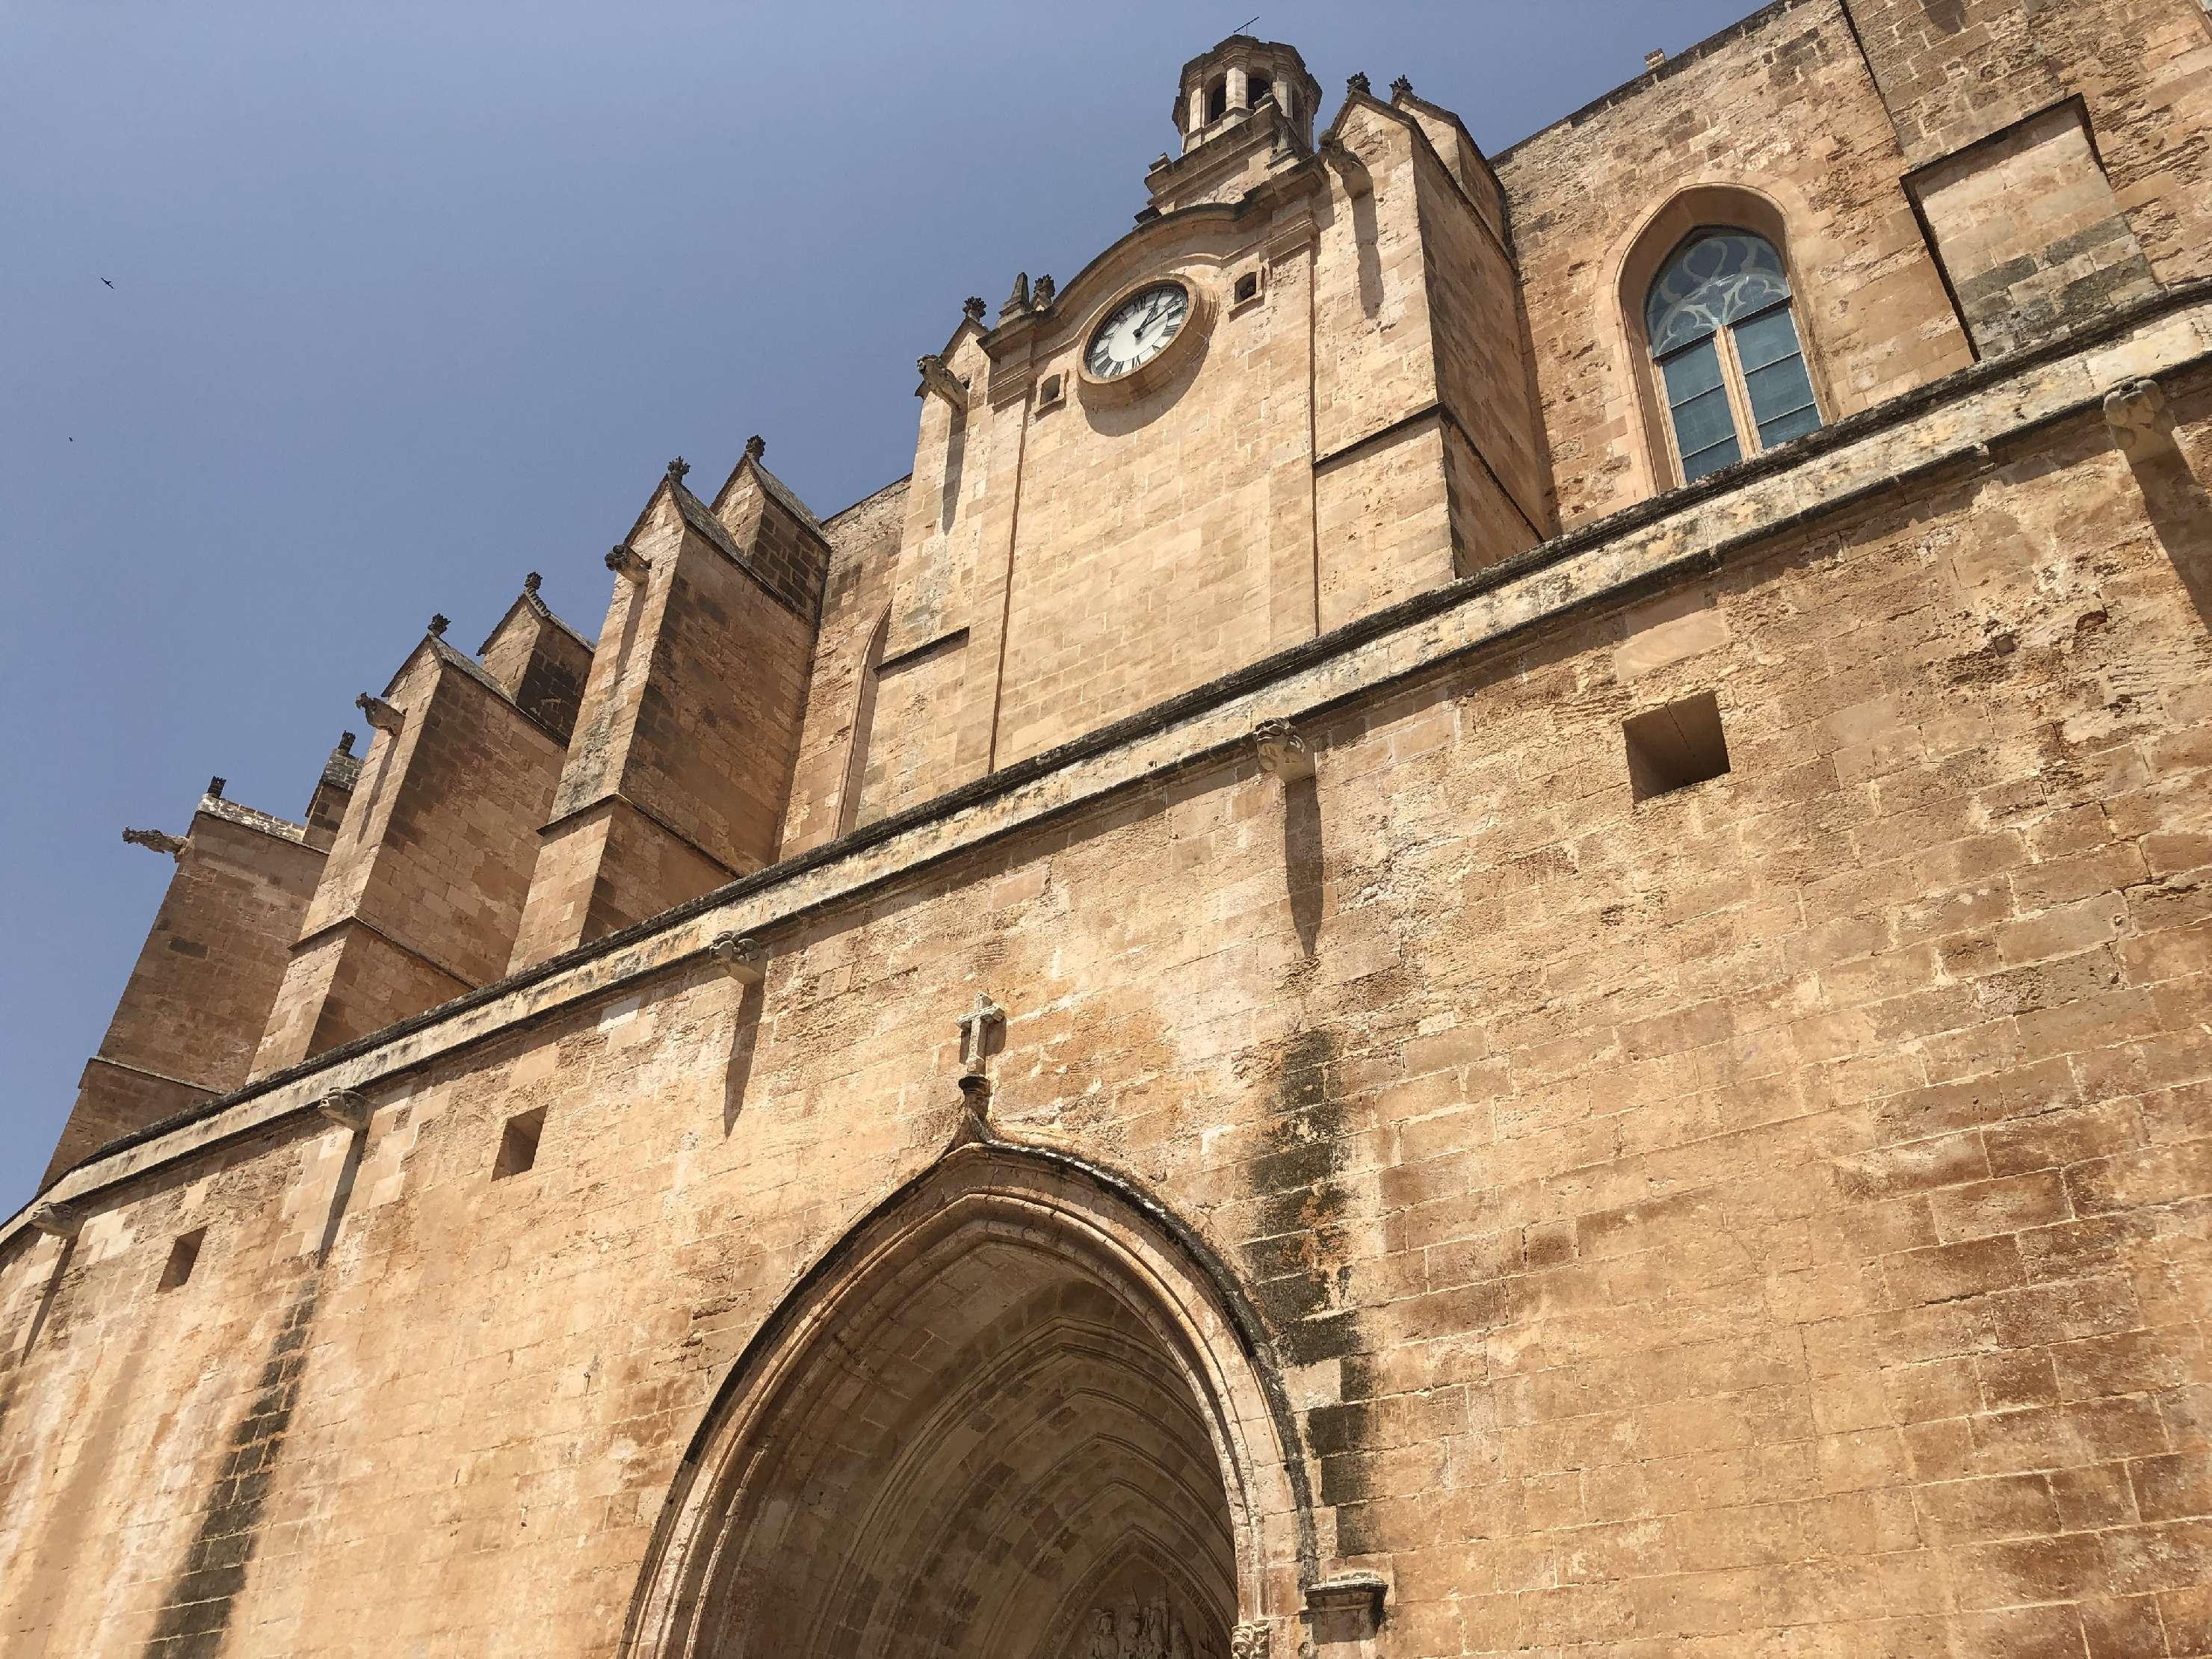 La plaça de la Catedral